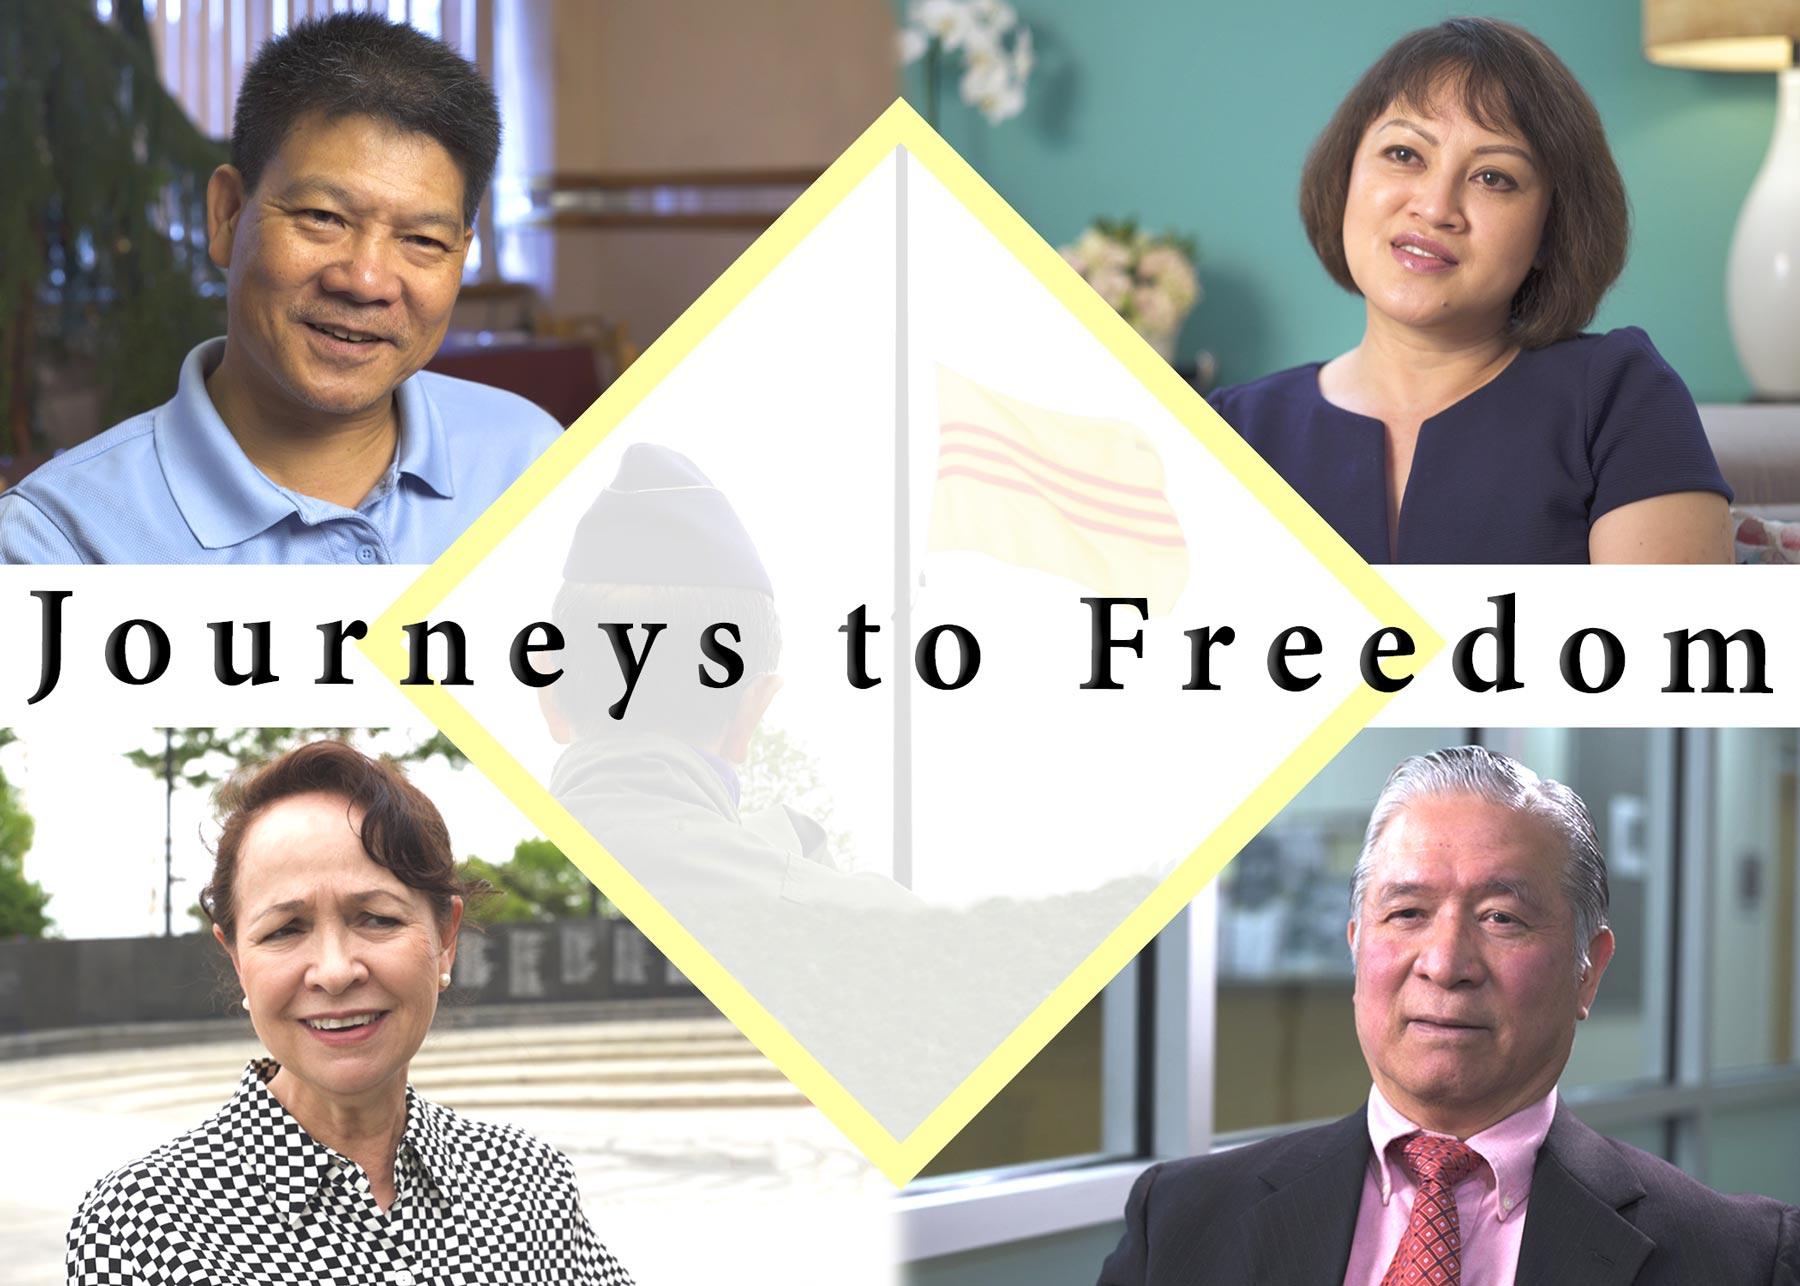 Journeys to Freedom still